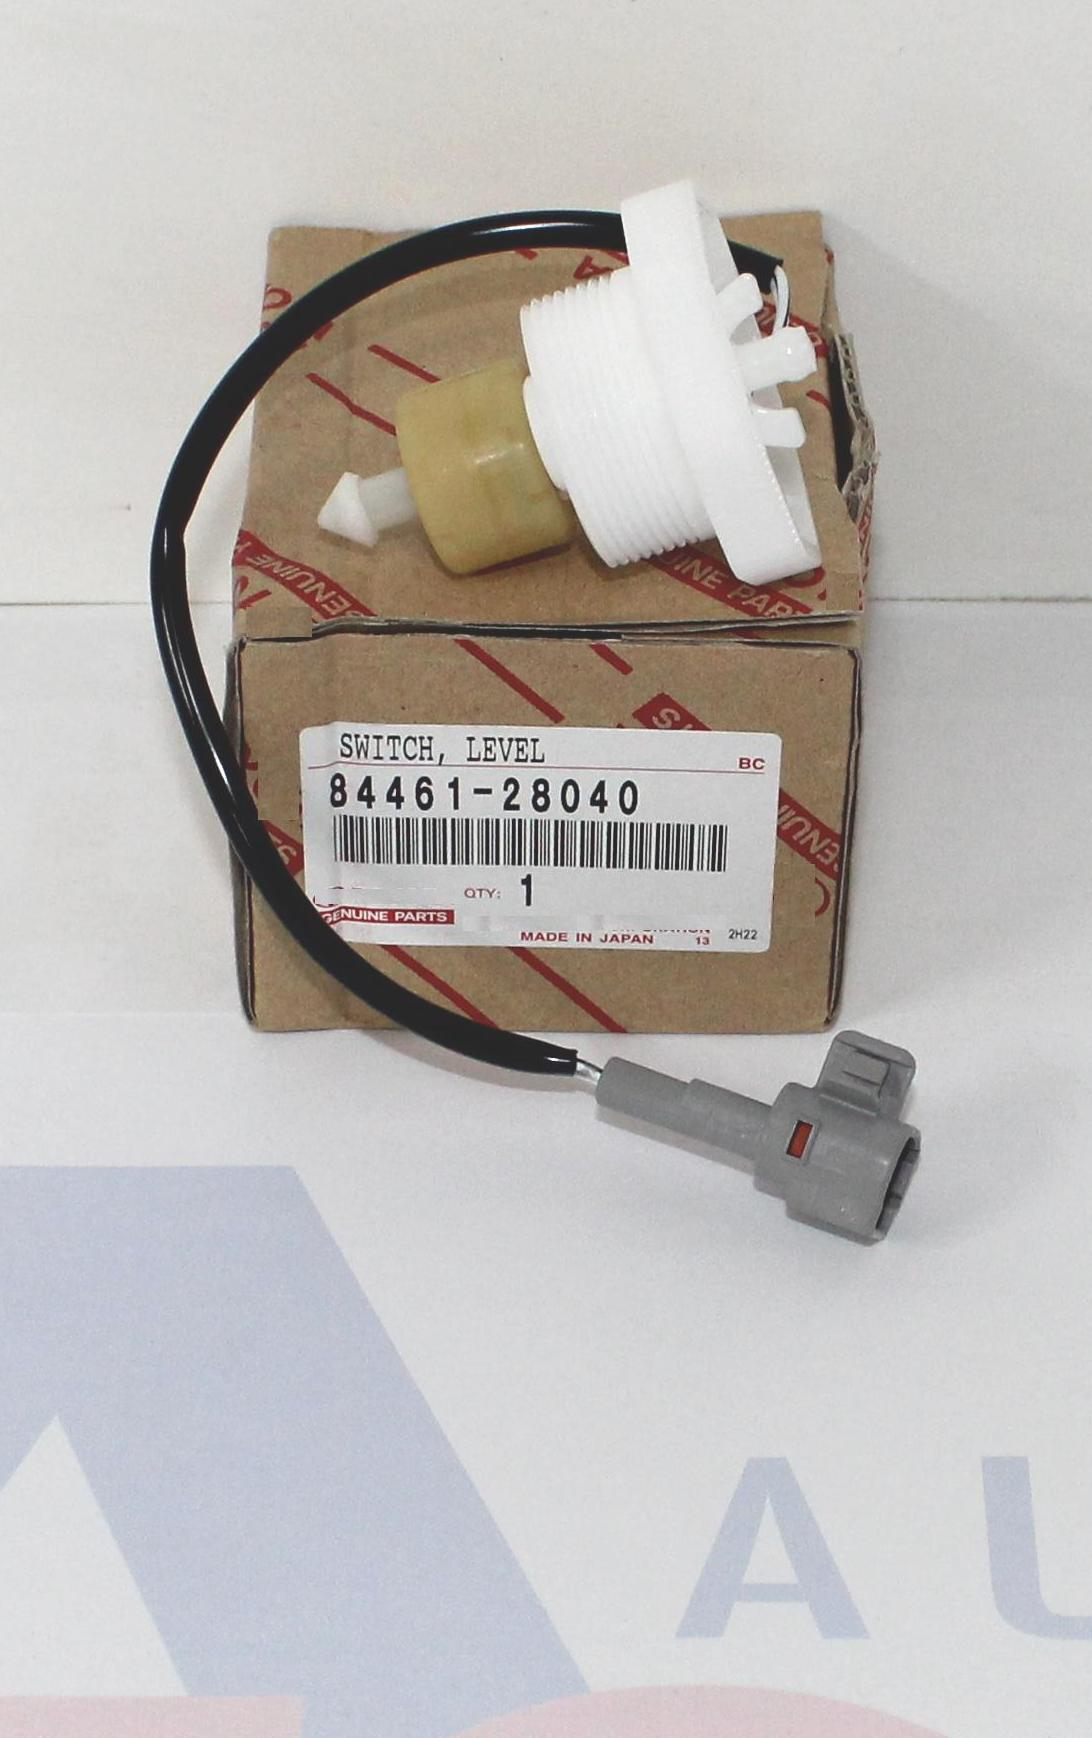 Oem Genuine Fuel Filter Water Sensor To Fit Toyota Landcruiser 2006 Mazda 6 Hzj105 Hdj100 Hilux Kzn165